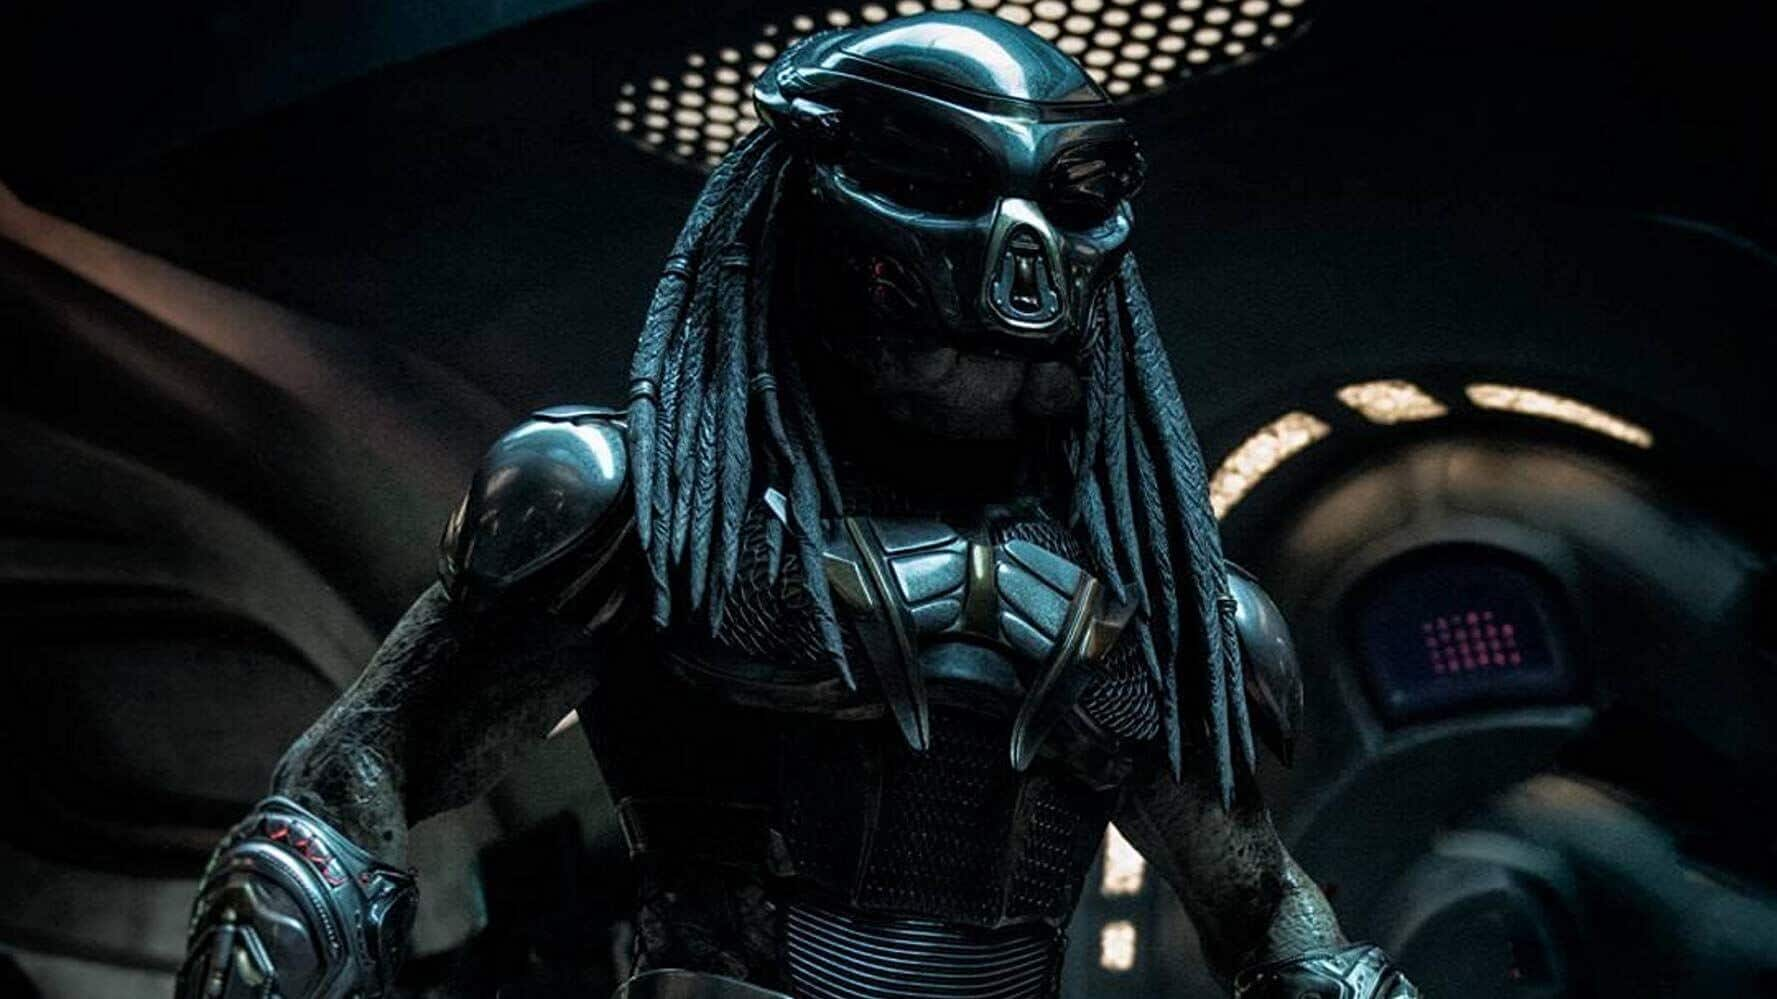 The Predator franchise tentpole unnecessary, PG-13 Dan Trachtenberg movie at smaller scale Skull Skulls may work